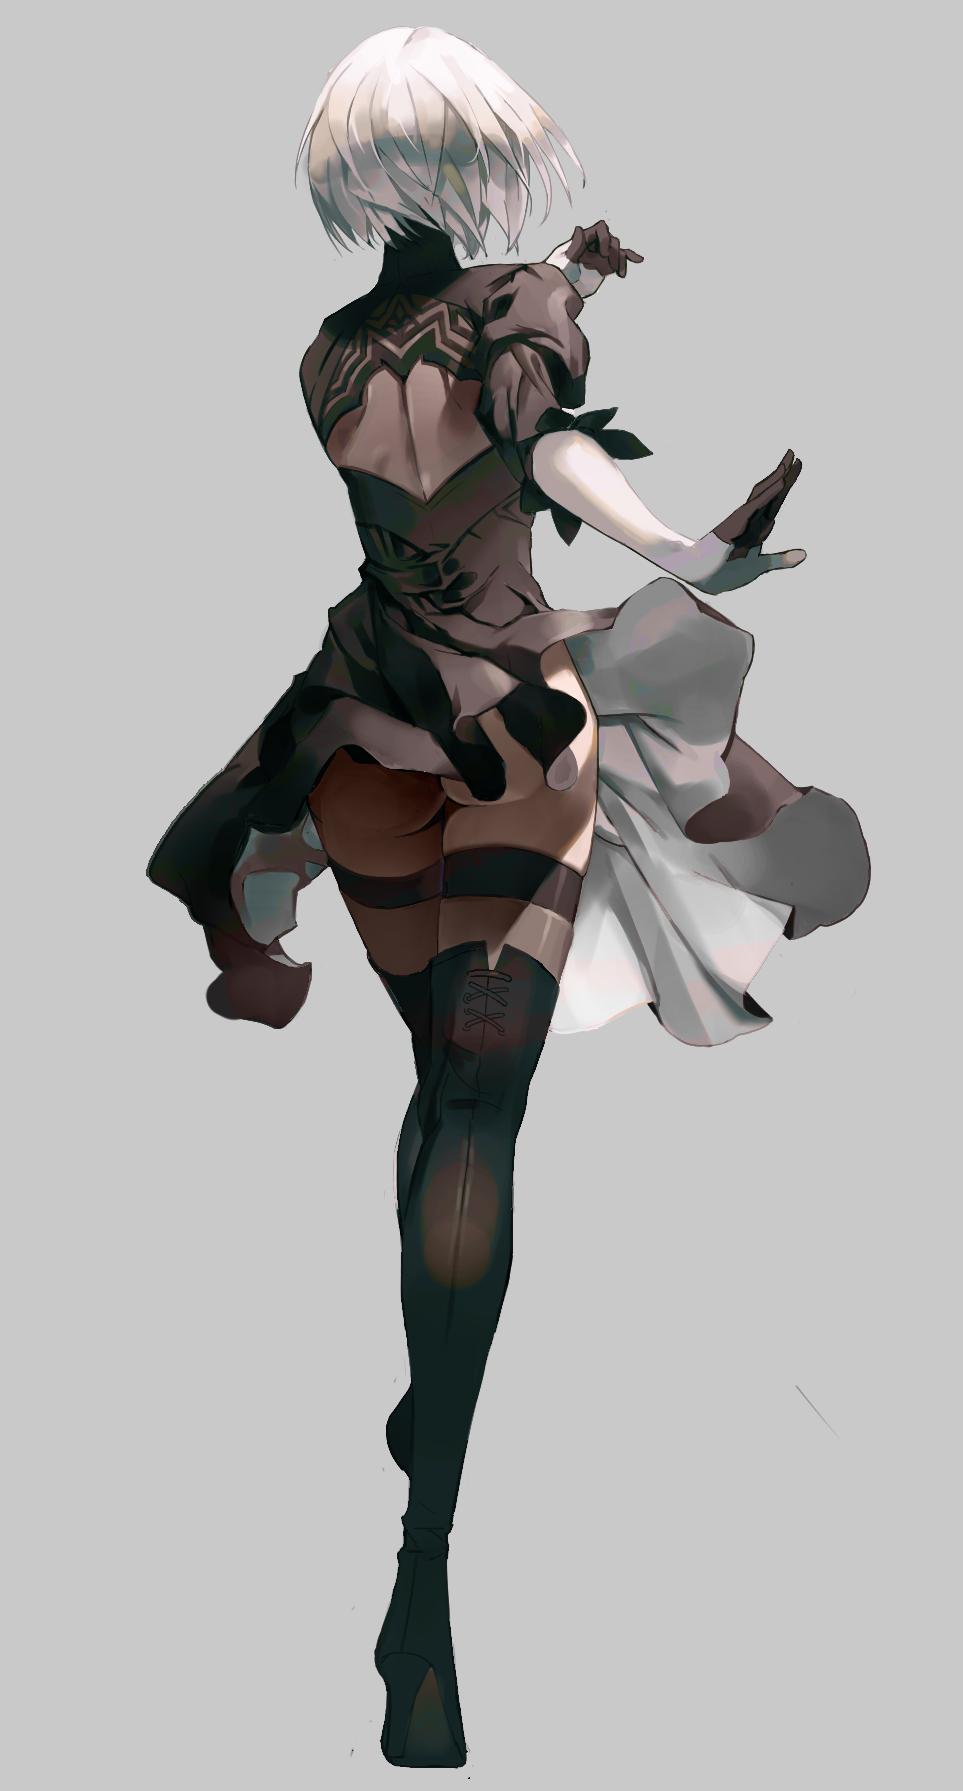 Nier Automata Yorha 2b Voitelnicy Anime Devushka Elfijka